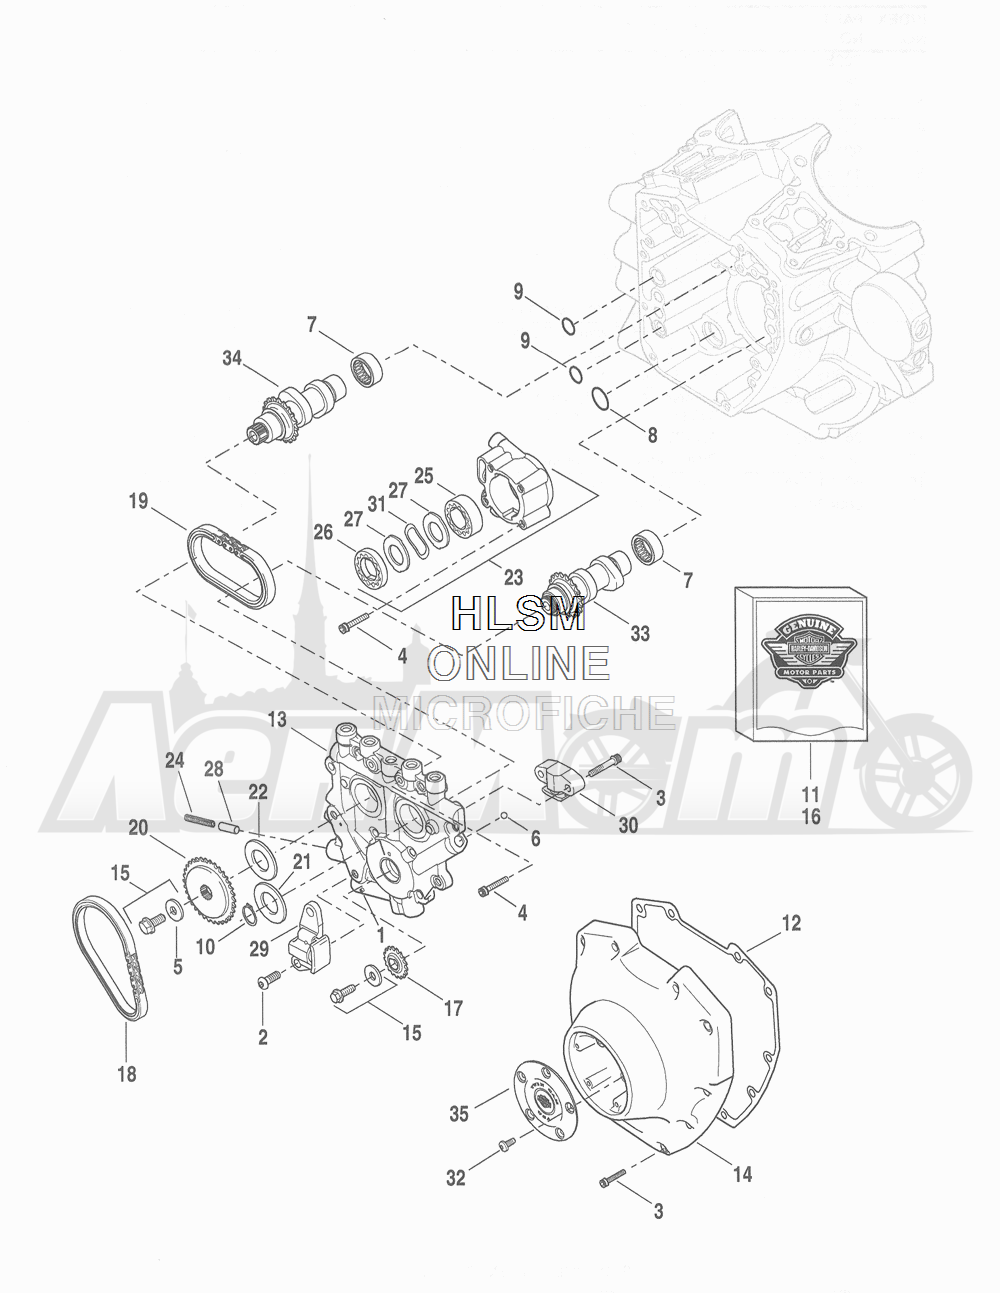 Запчасти для Мотоцикла Harley-Davidson 2016 FLHTCU 103 ULTRA CLASSIC ELECTRAGLIDE (FCM) Раздел: CAMSHAFTS W/ CAMSHAFT COVER | распредвалы вместе с распредвал крышка